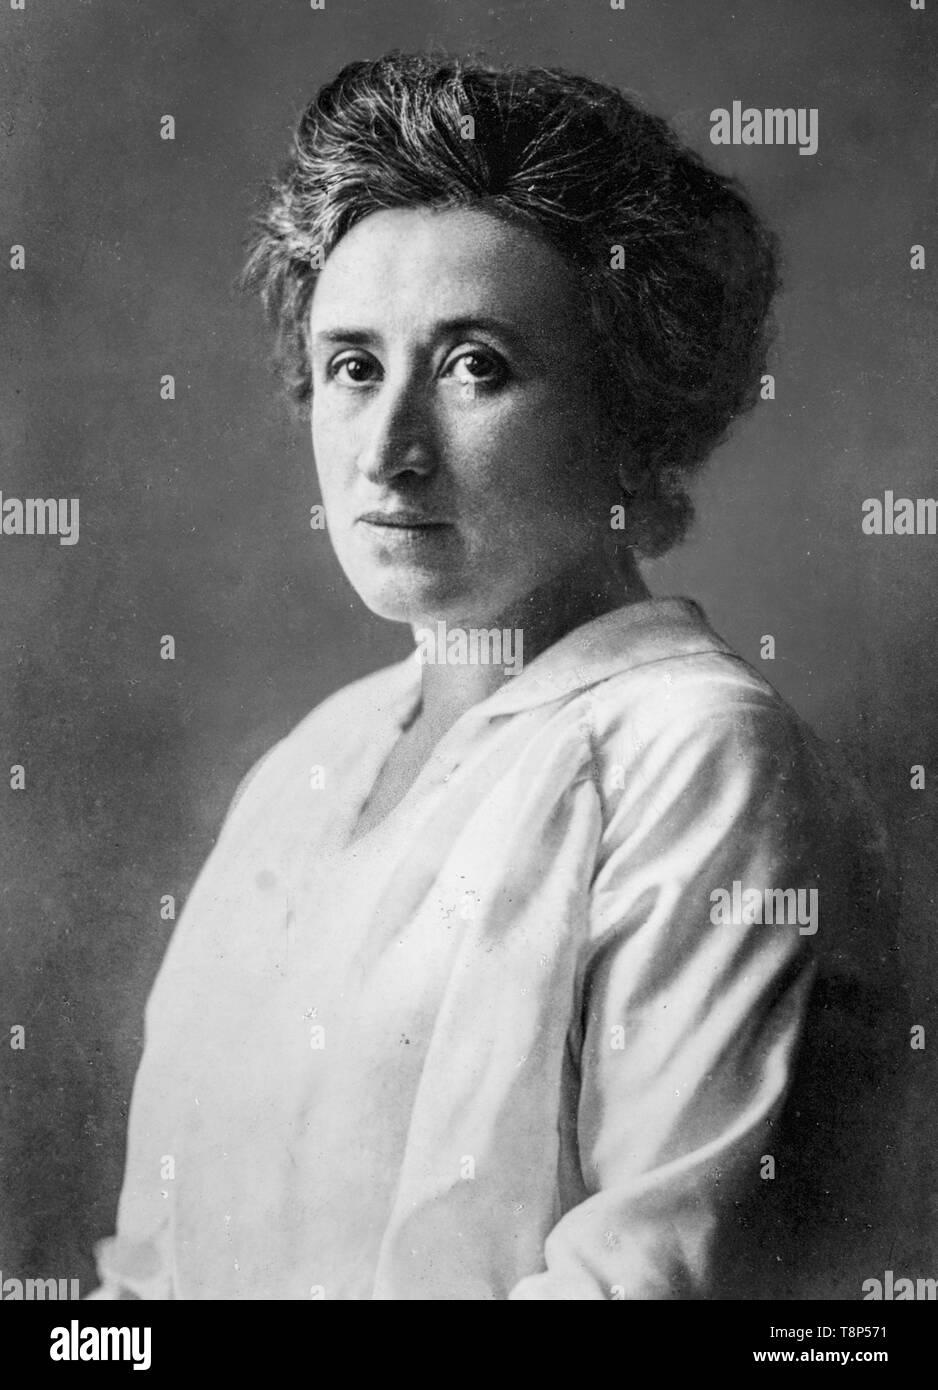 Rosa Luxemburg, portrait photograph, c. 1895 - Stock Image